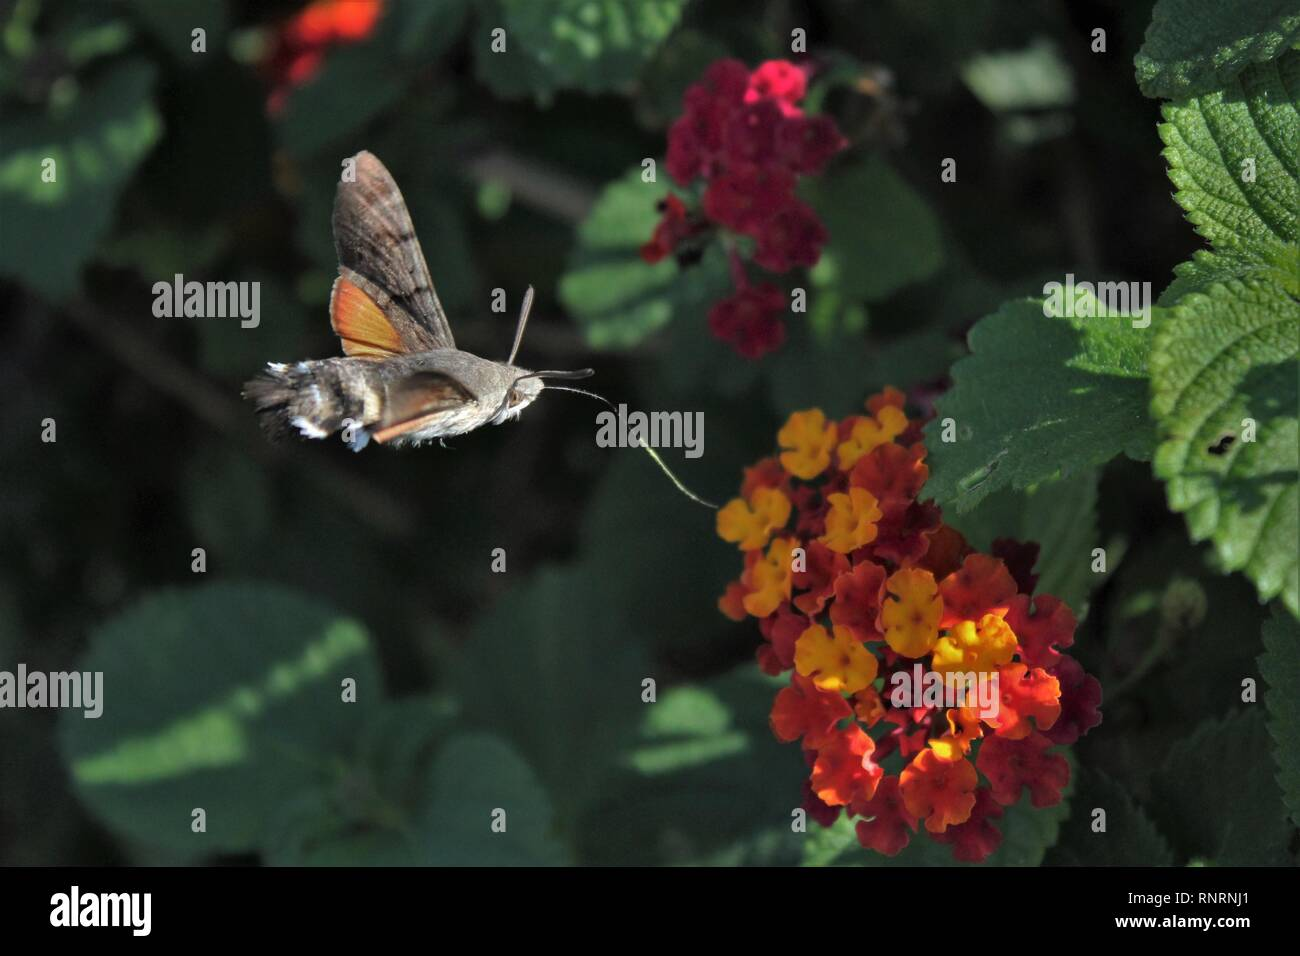 Hummingbird Hawk-moth (Macroglossum stellatarum), feeding on flowers of Tickberry (Lantana camara) at Mellieha, Malta - Stock Image